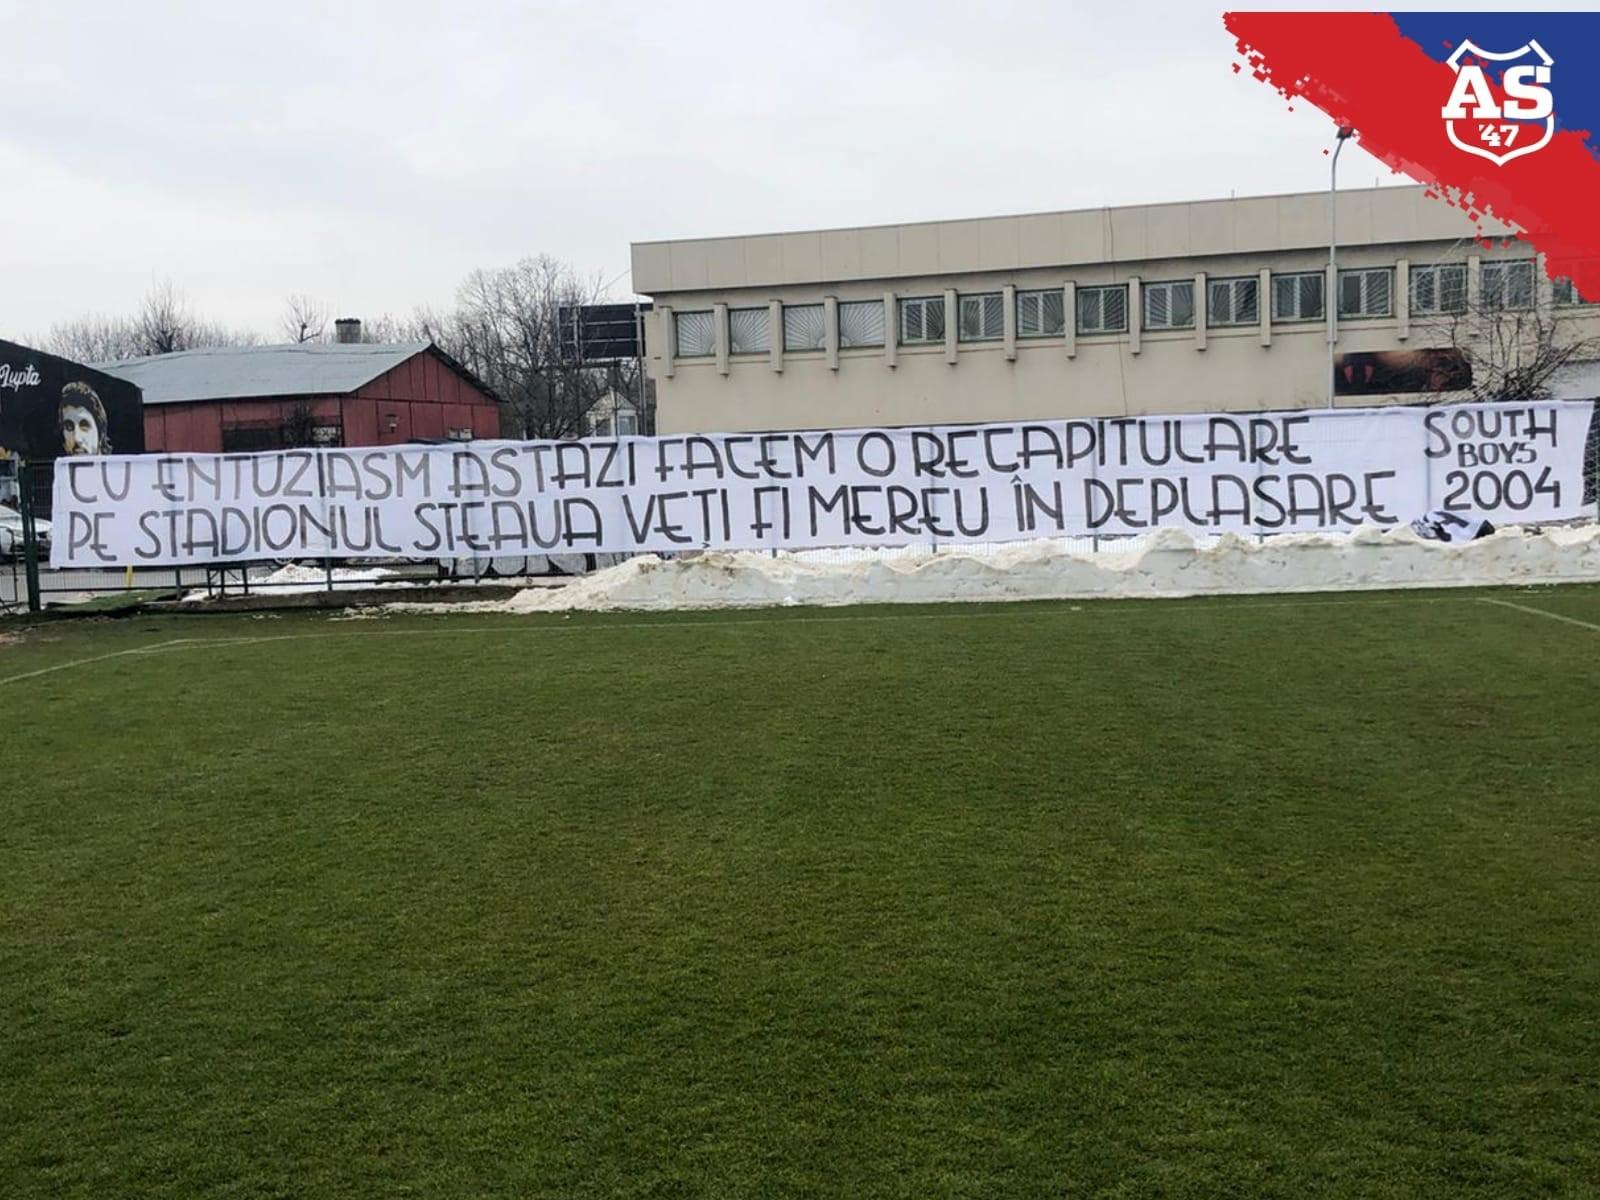 https://i.eurosport.com/2021/03/13/3010956.jpg